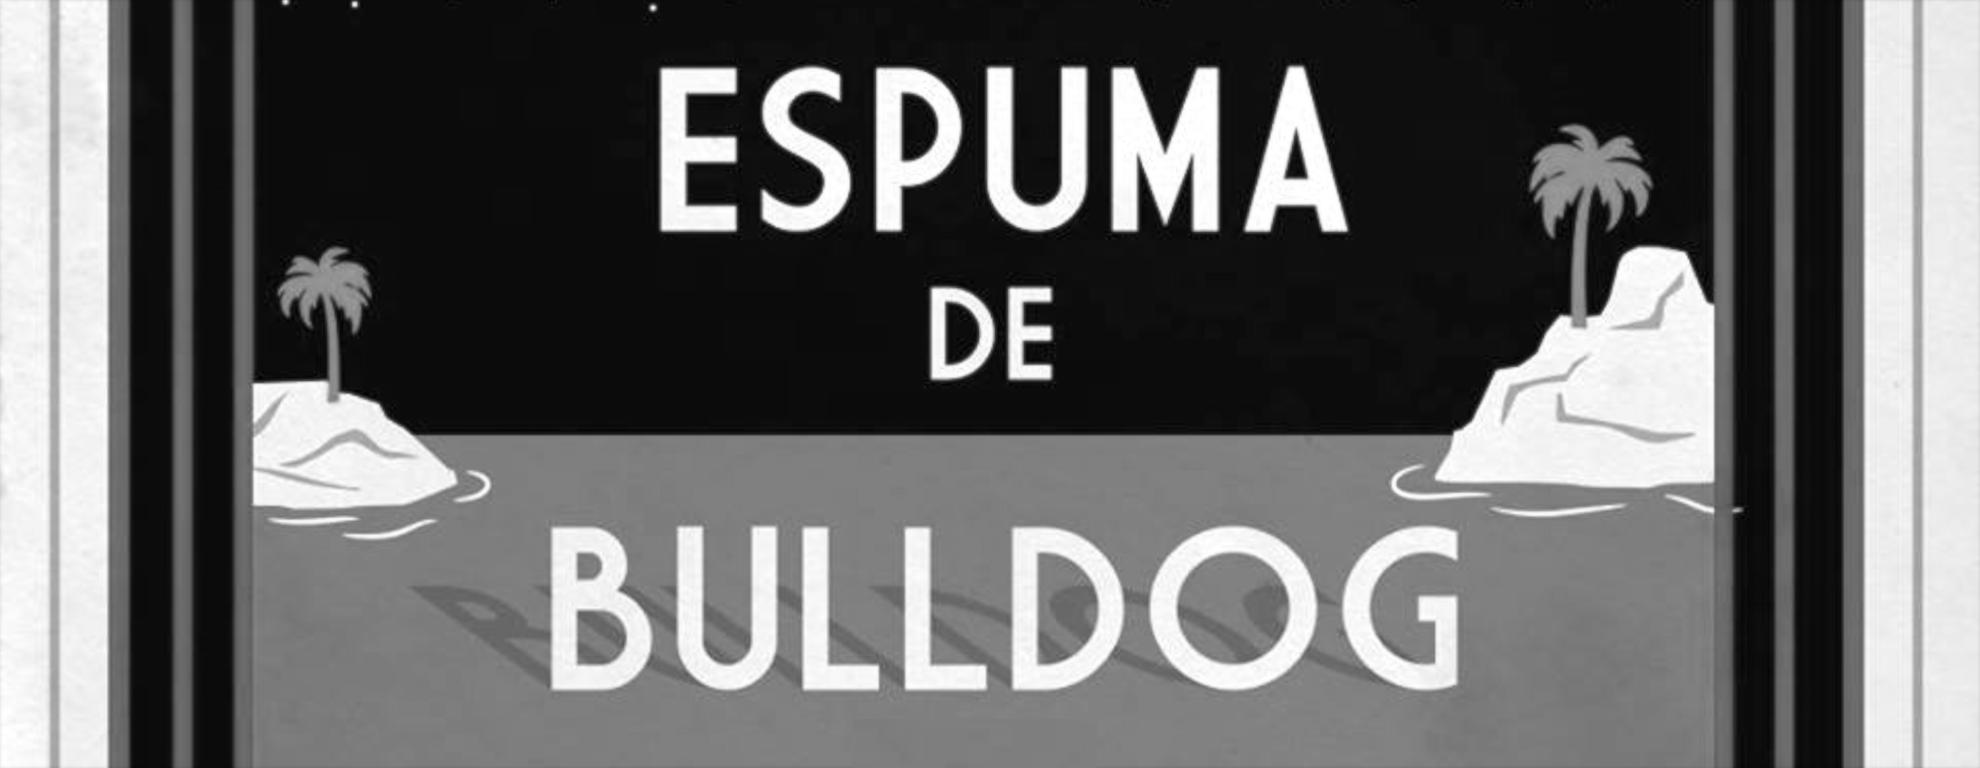 Previsualizacio?n – Espuma de Bulldog